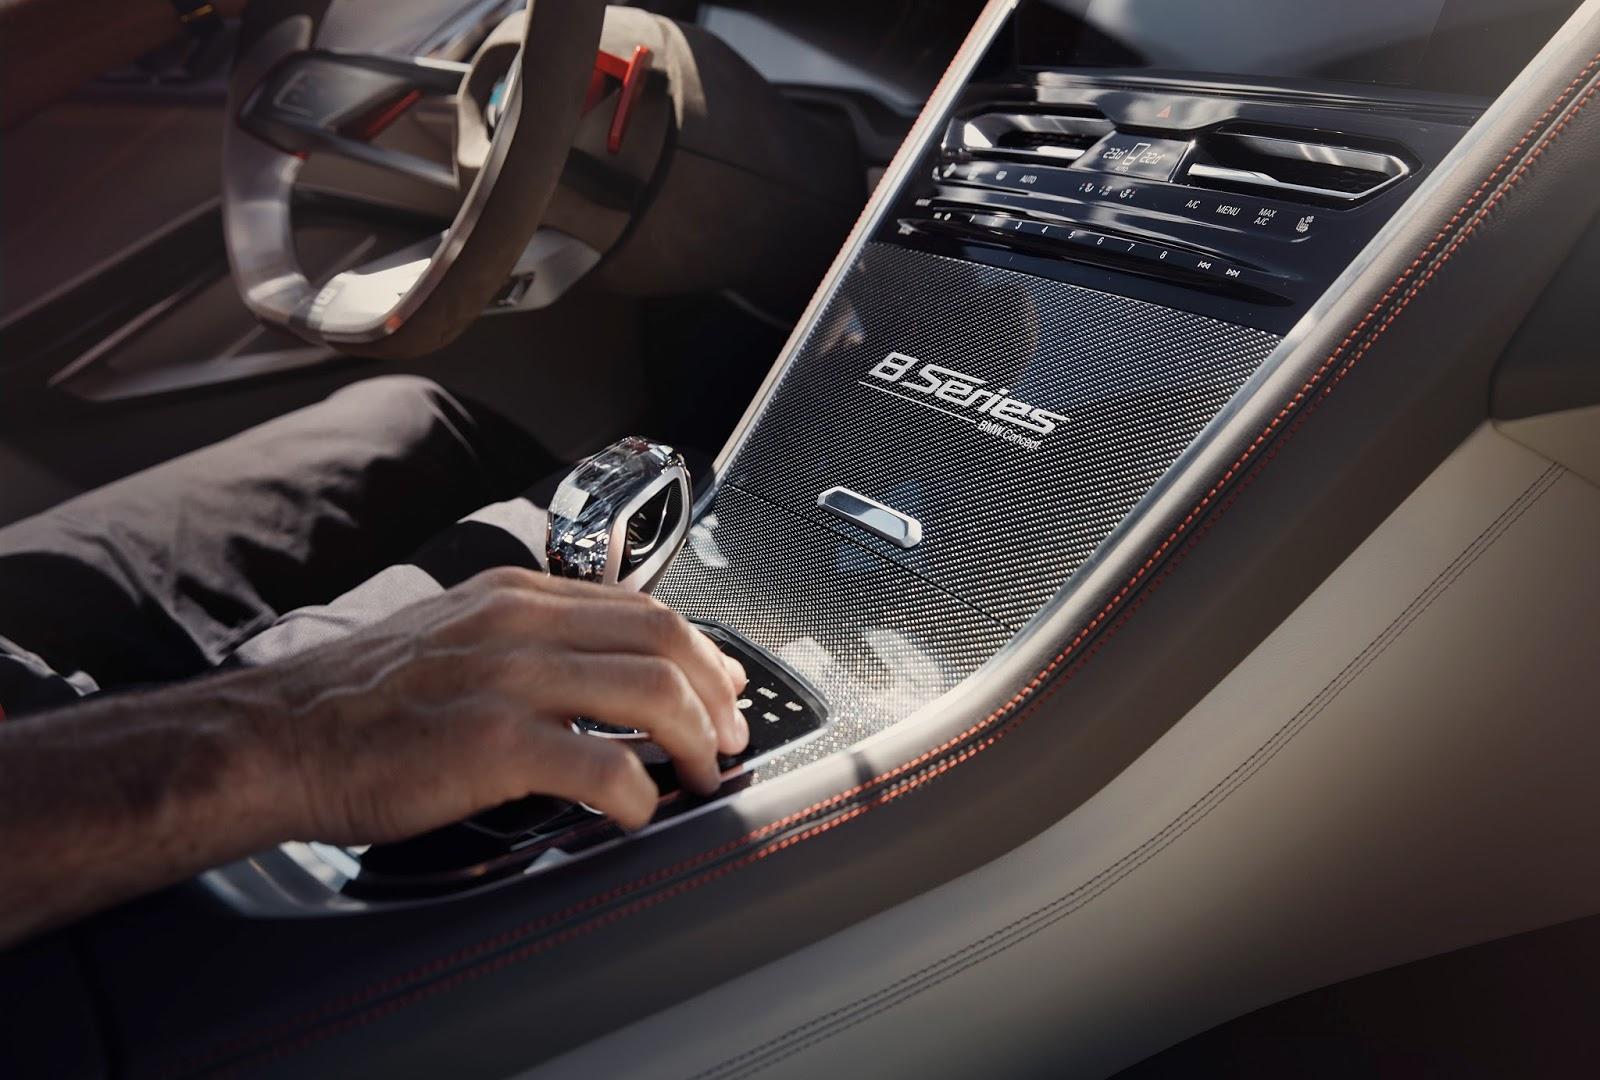 P90261163 highRes bmw concept 8 series Η BMW Σειρά 8 Coupe είναι η πεμπτουσία των μελλοντικών σπορ αυτοκινήτων